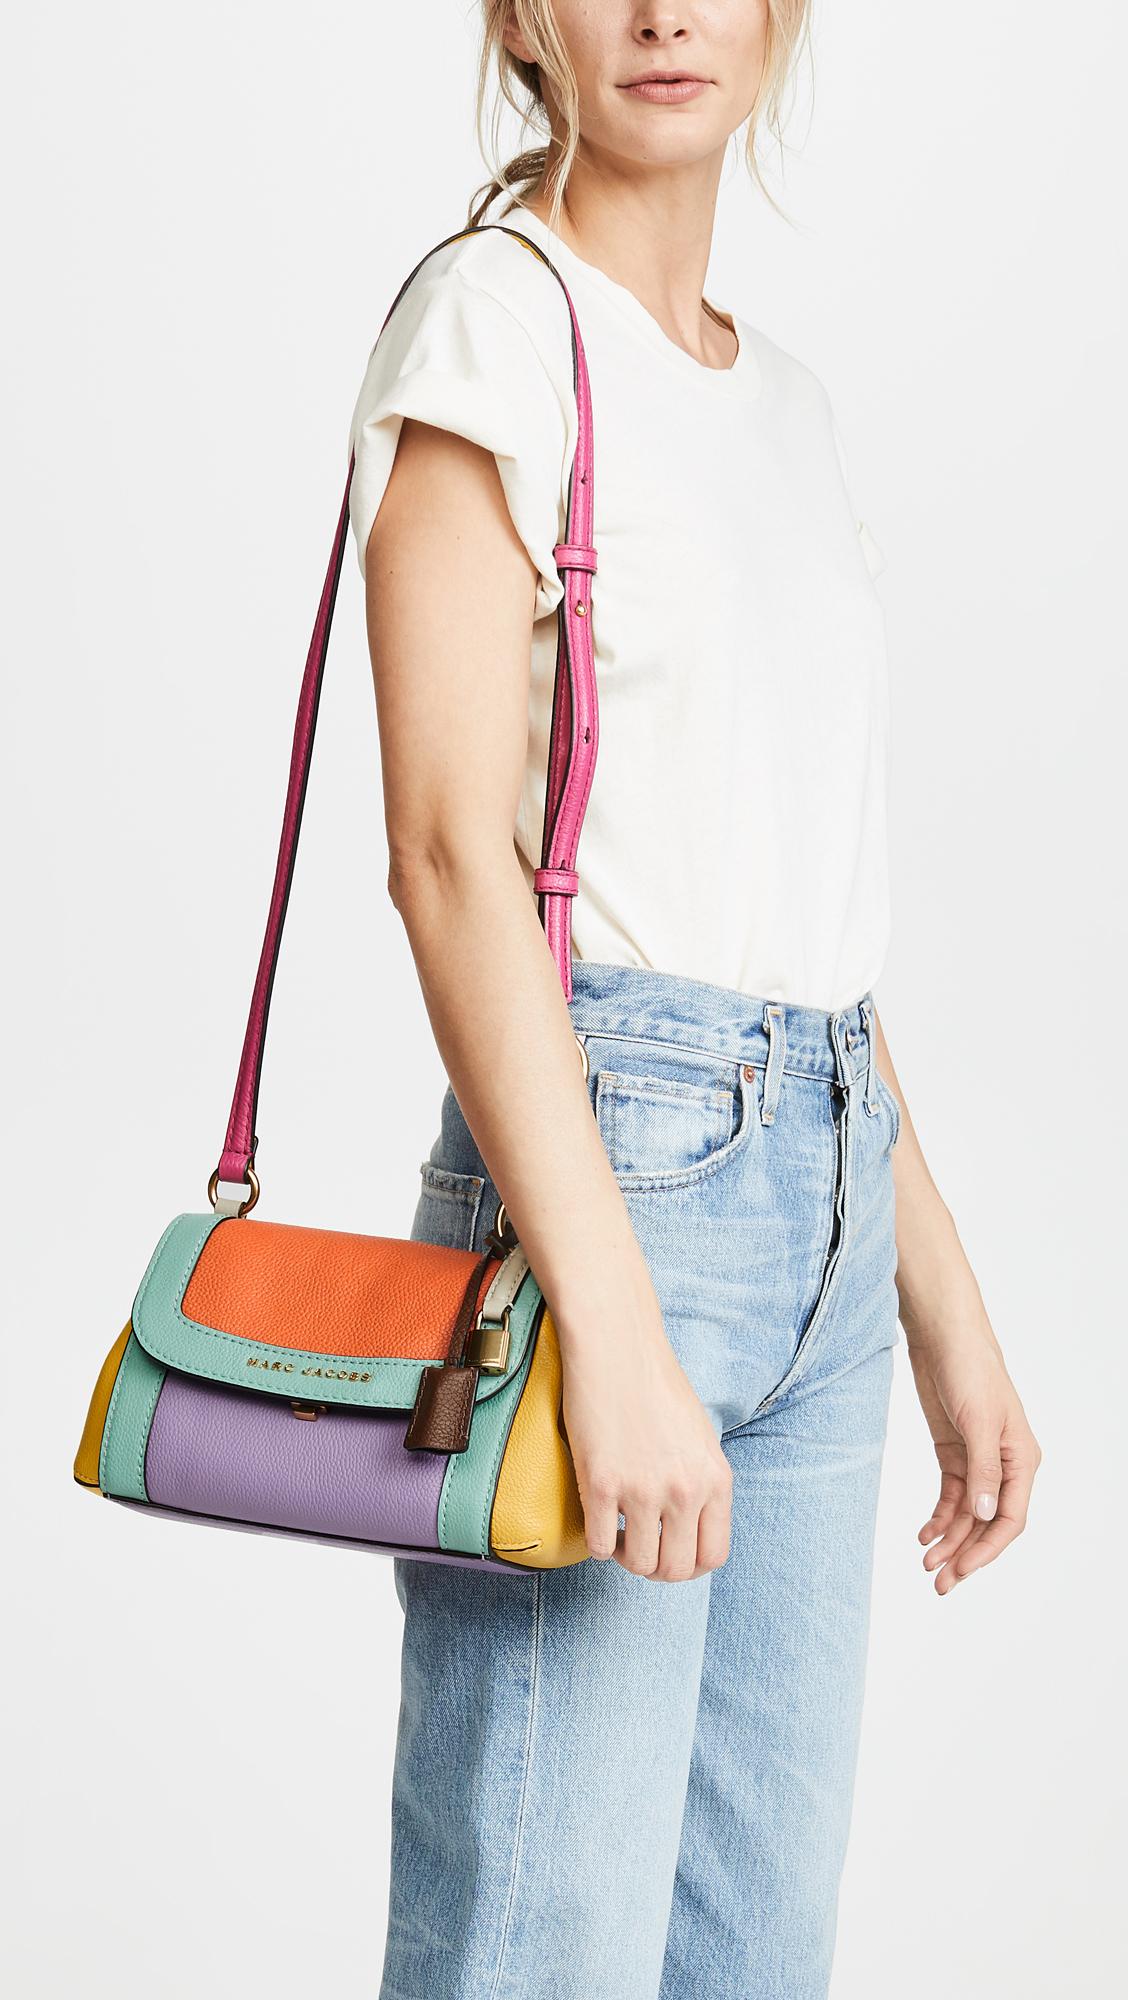 71306e09c7dec Marc Jacobs Mini Colorblocked Boho Grind Bag